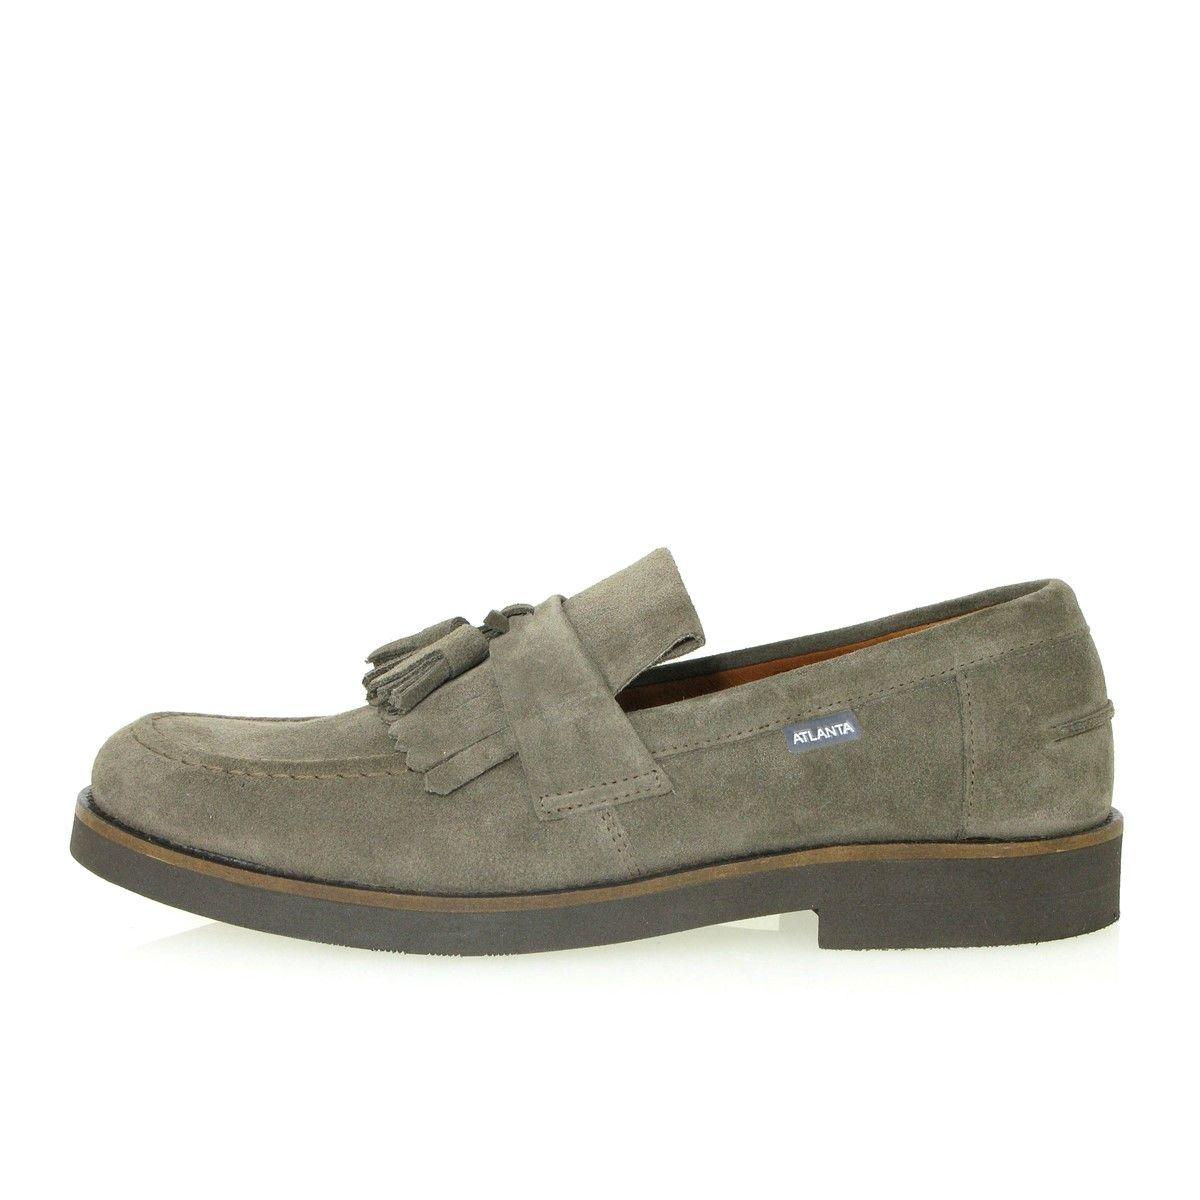 Chaussures mocassins gland en daim